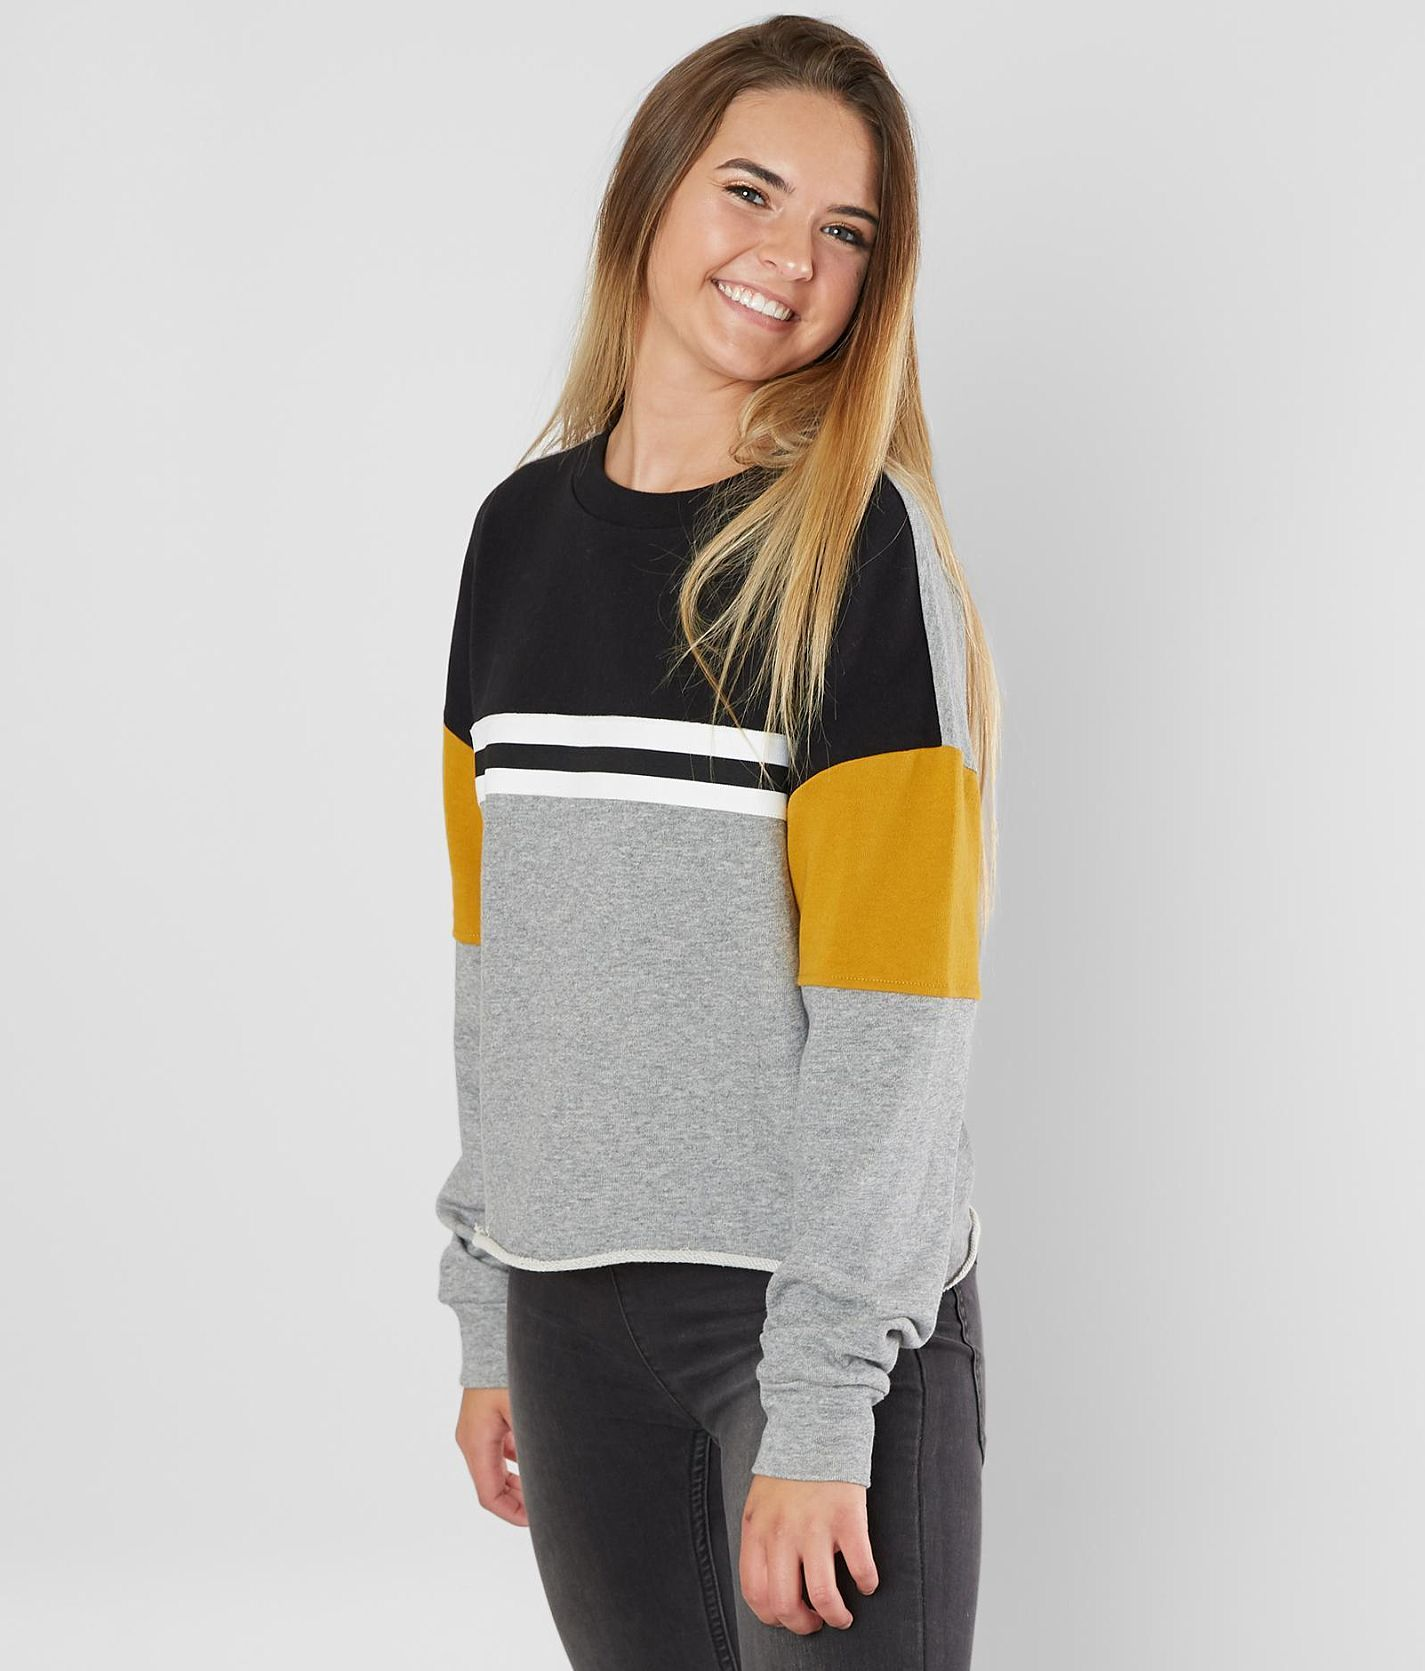 8fb8183570 Daytrip Striped Sweatshirt - Women s Sweatshirts in Black Grey Mustard